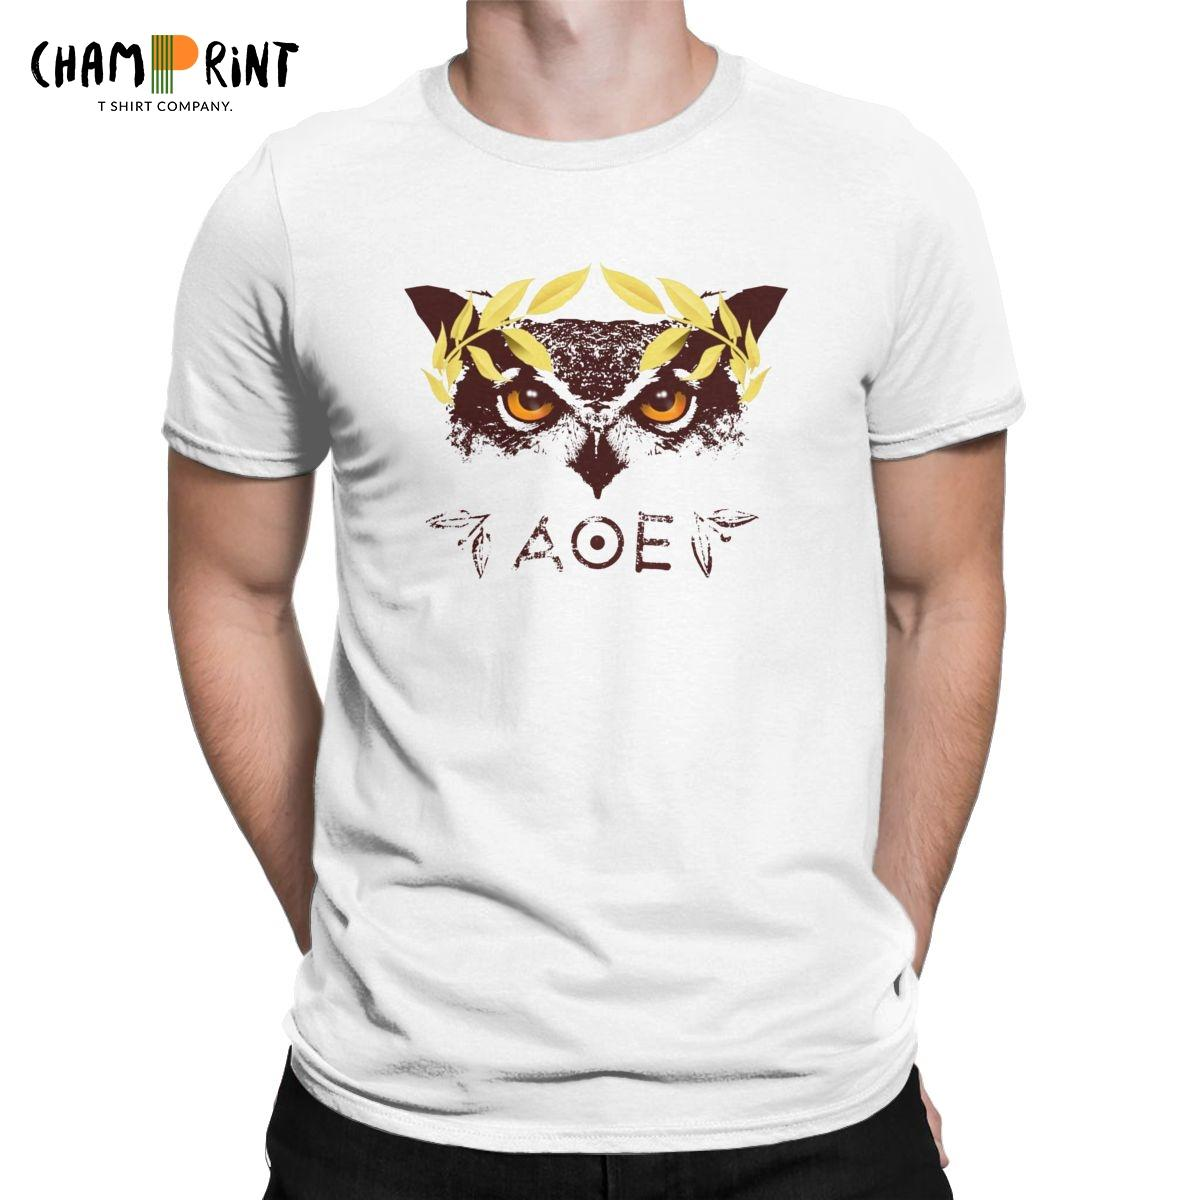 Pallas Athena's Owl T Shirts Men Pure Cotton Hipster T-Shirt Greek Goddess Mythology Tee Shirt Short Sleeve Clothing Plus Size